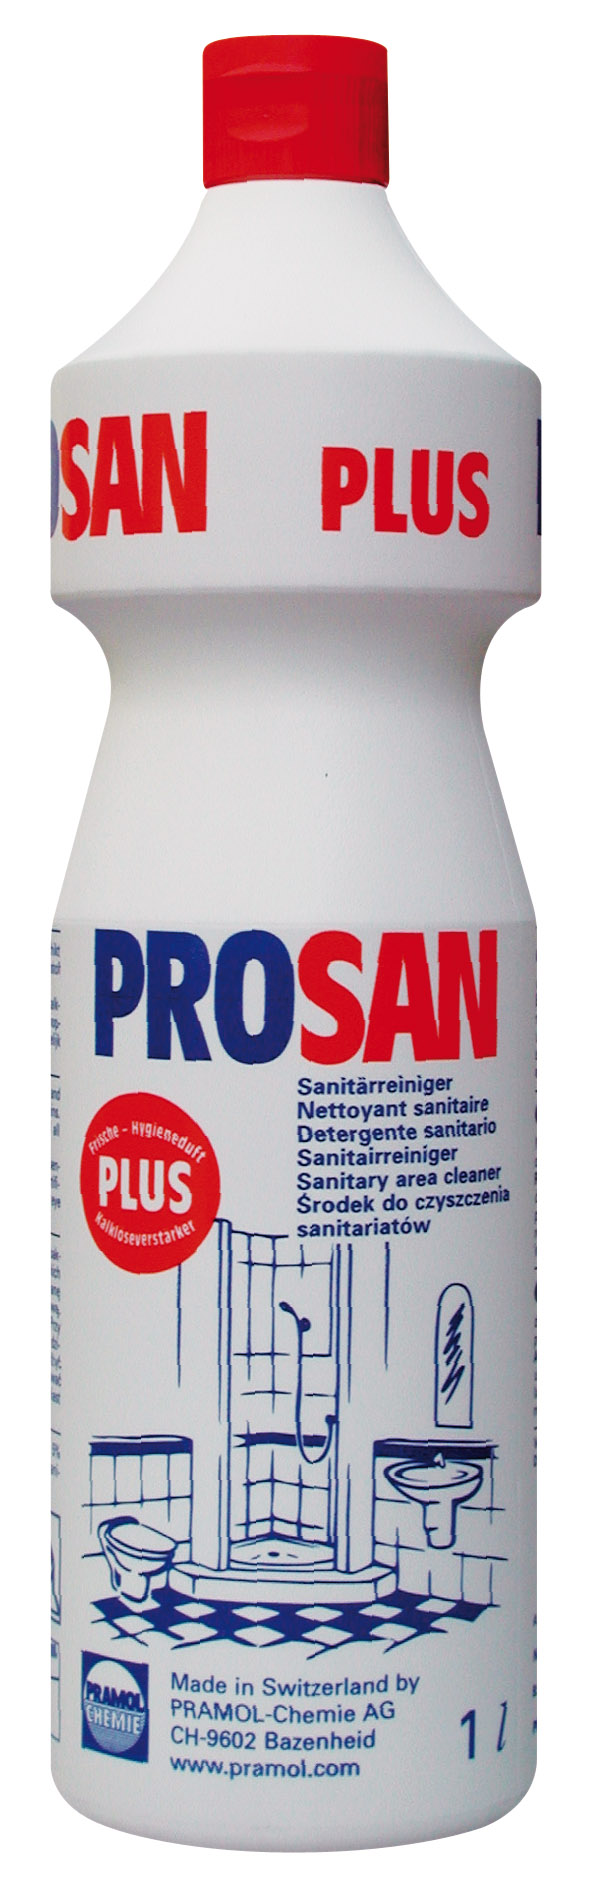 Pramol PROSAN PLUS Sanitärreiniger, rot, 1 Liter